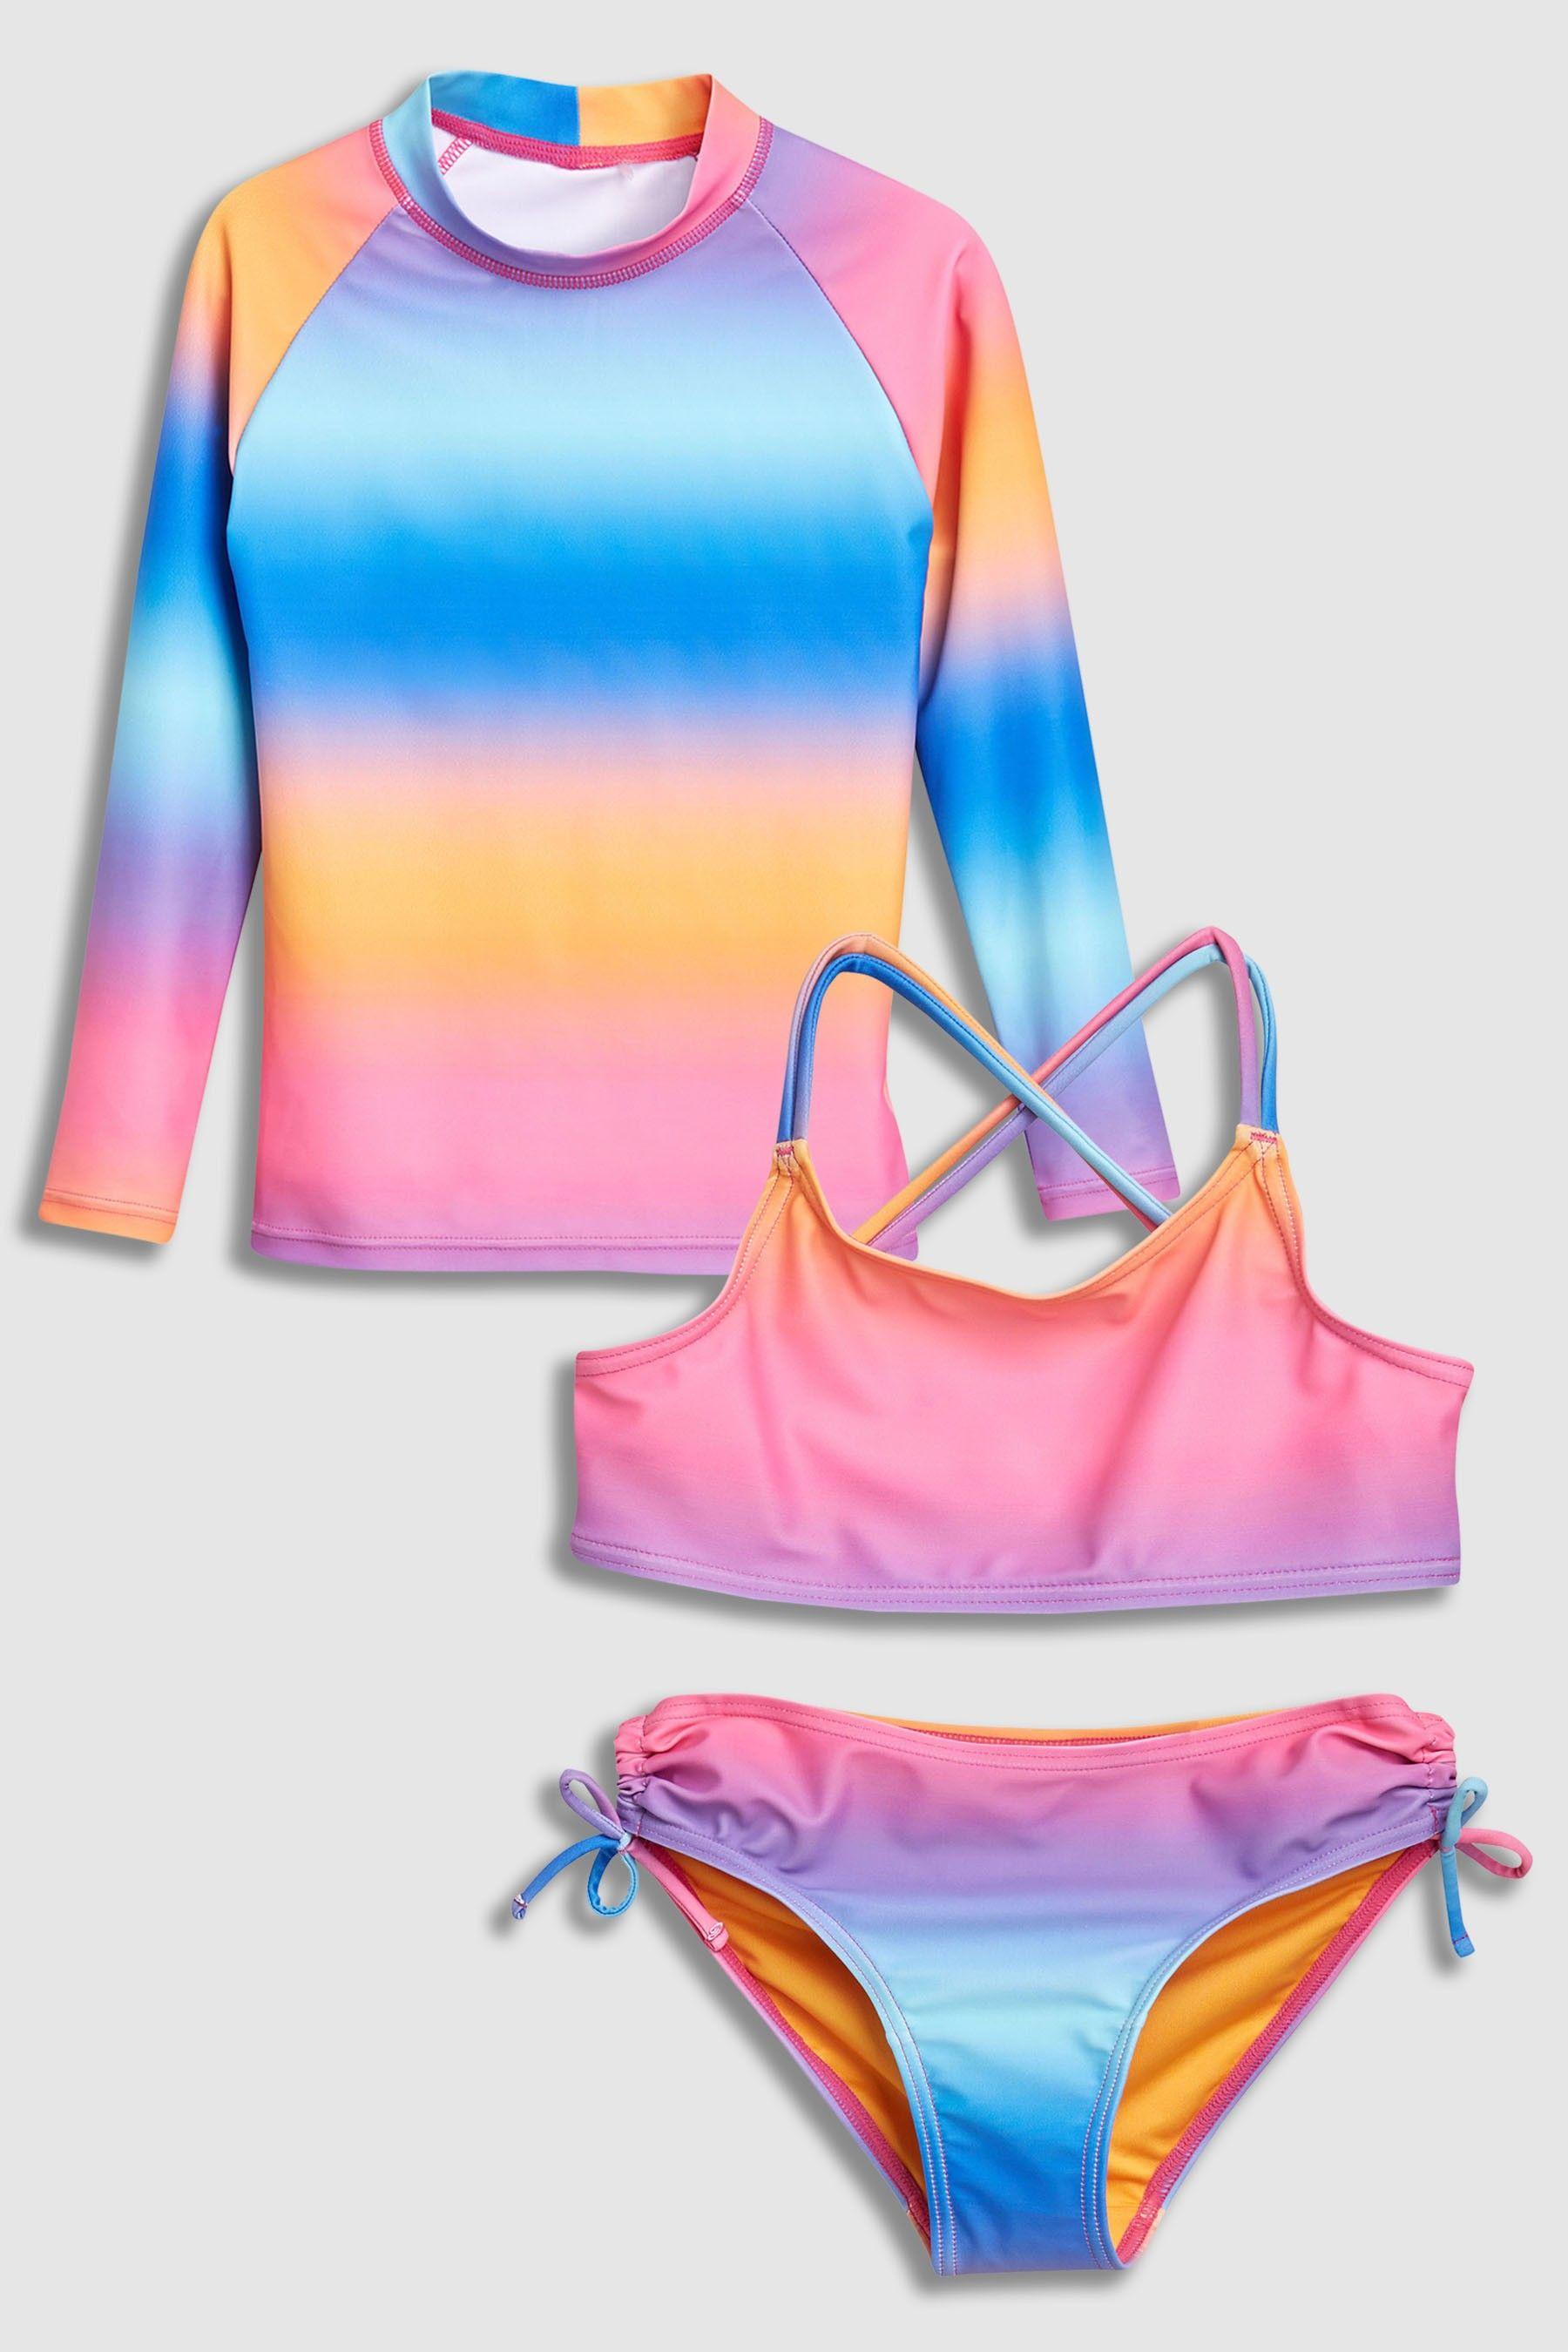 7e5c334a6cca0 Girls Next Ombre Three Piece Sunsafe Set (3-16yrs) - Blue | Products ...